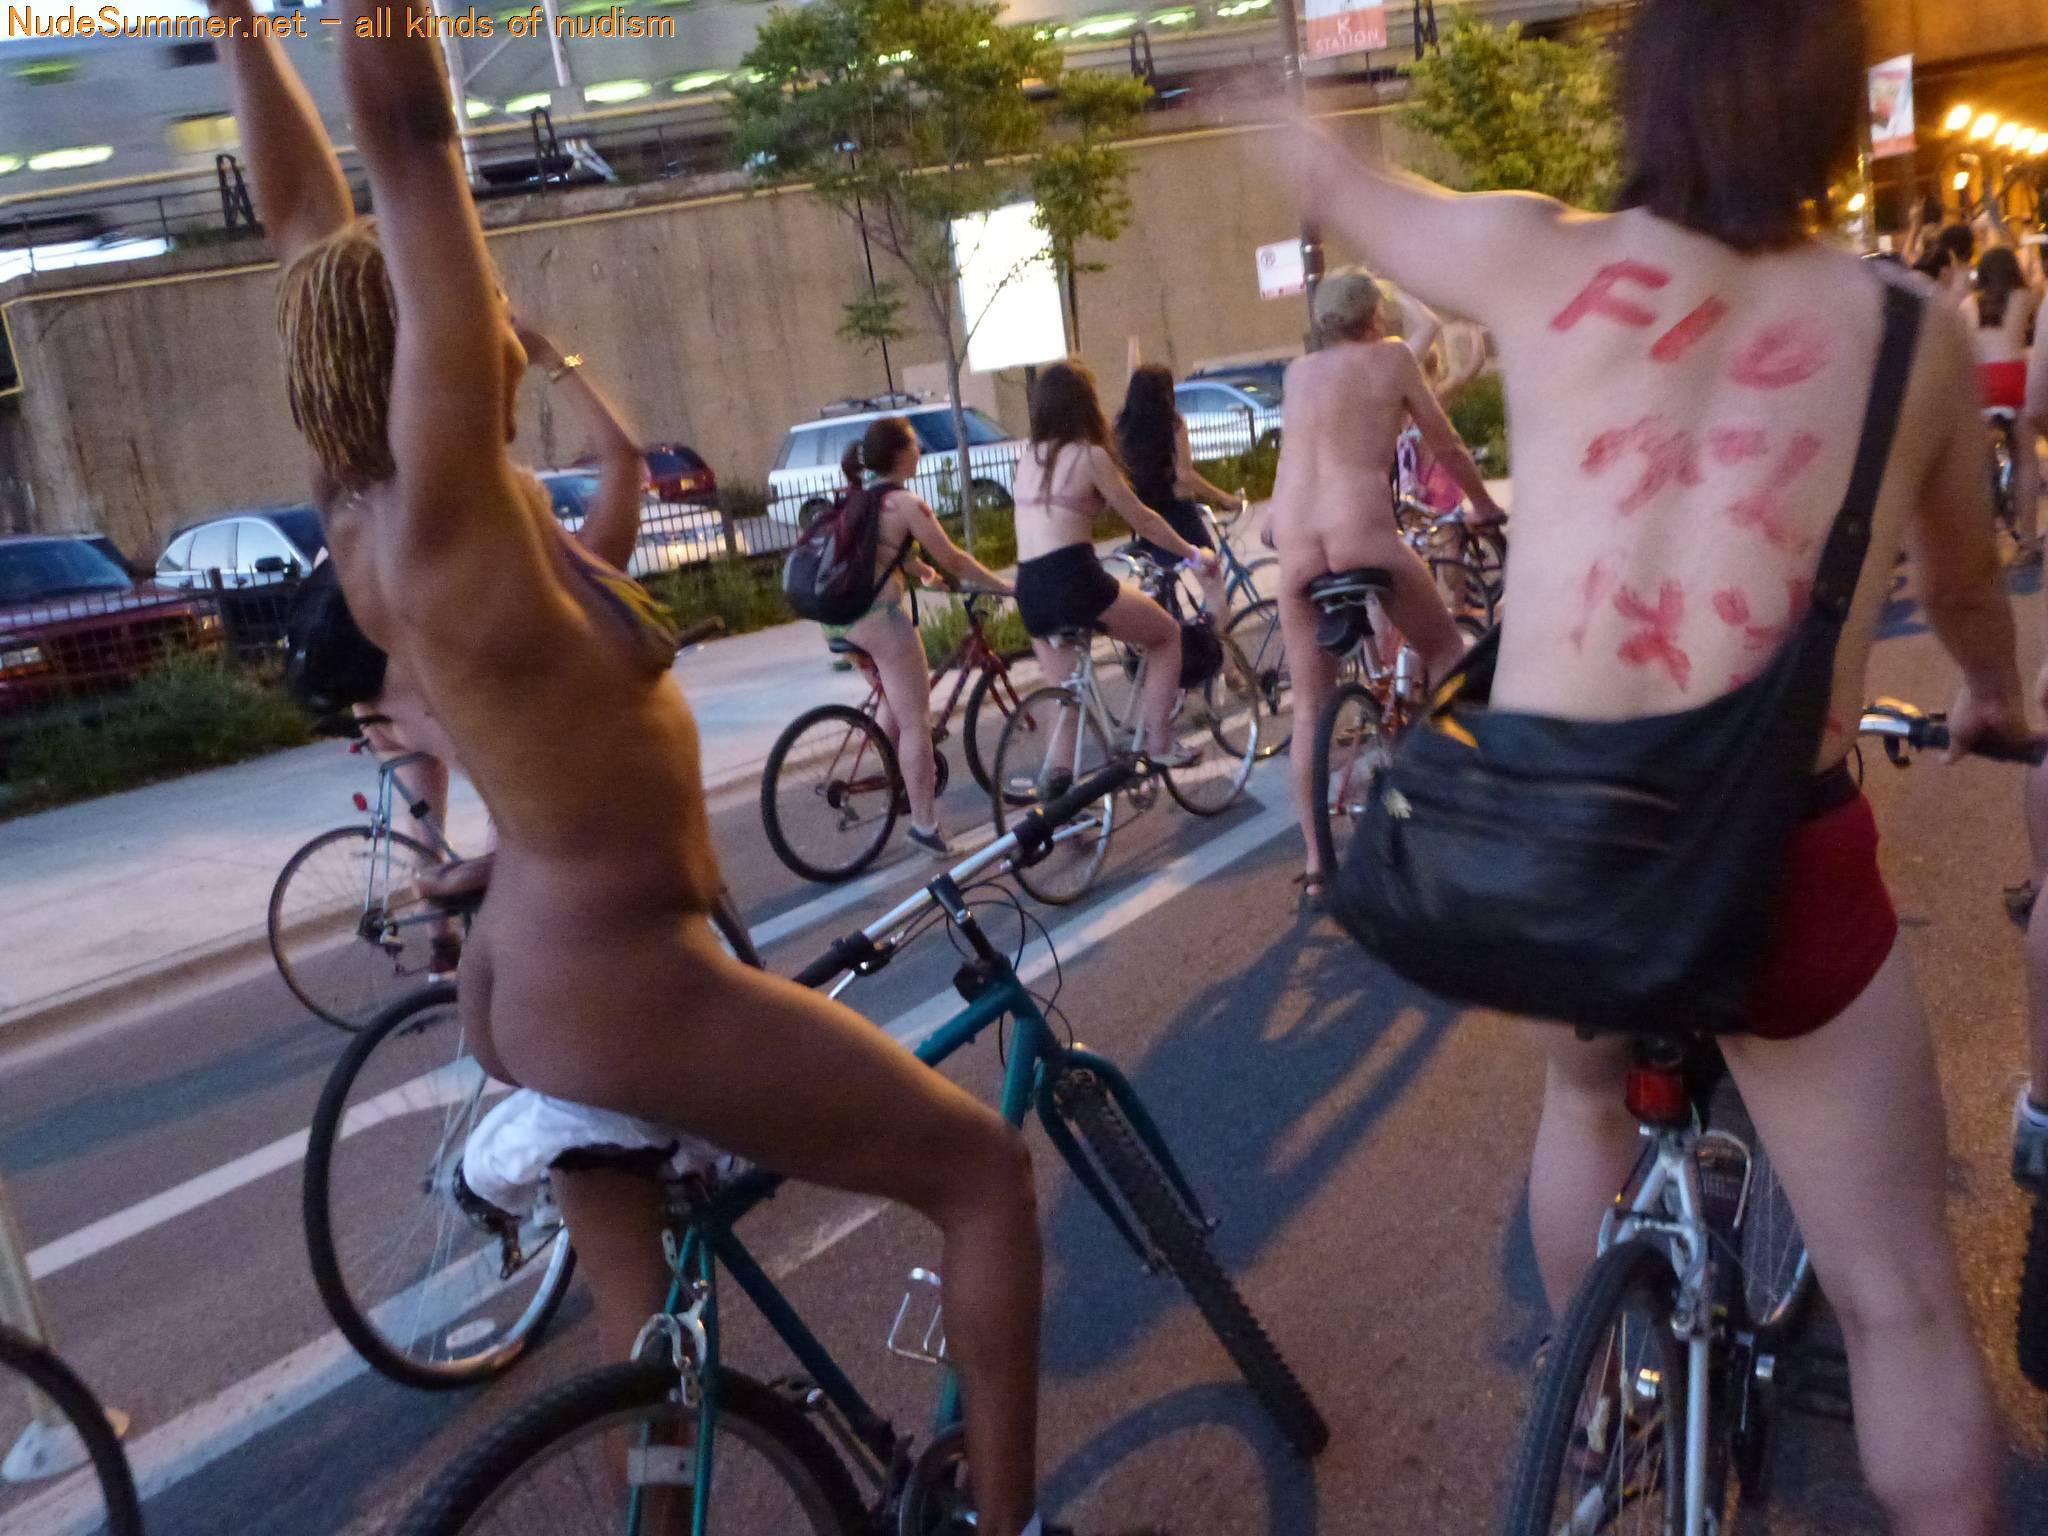 World Naked Bike Ride (WNBR) 2012 Part 1 - 1